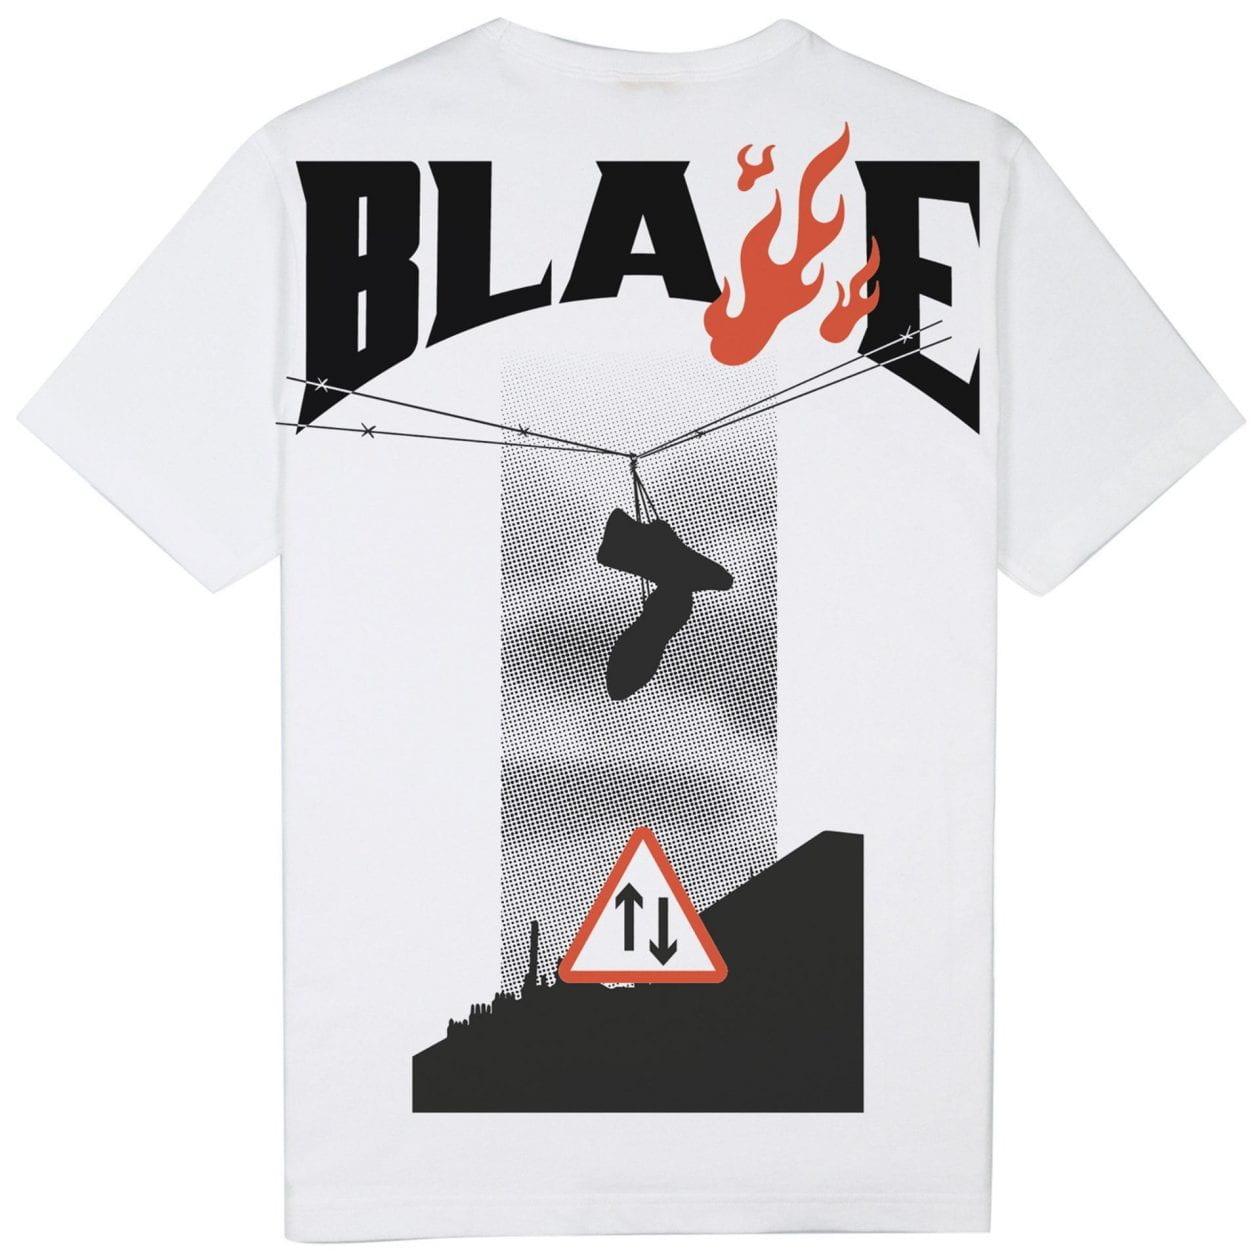 Blaze Williams